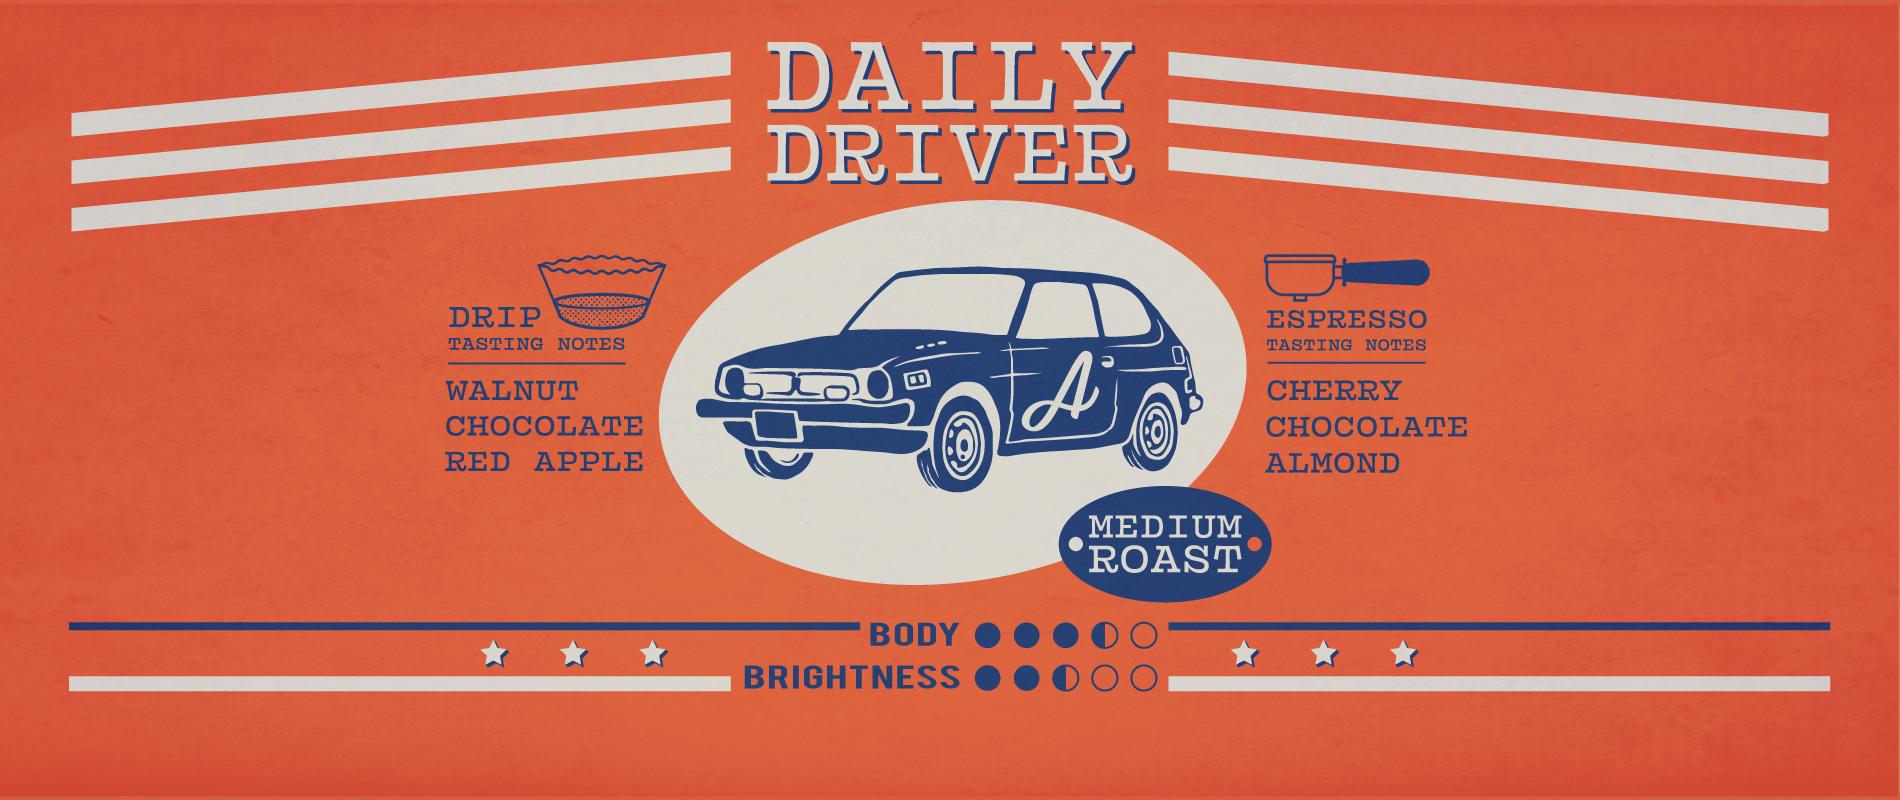 DailyDriver-web-promo.jpg